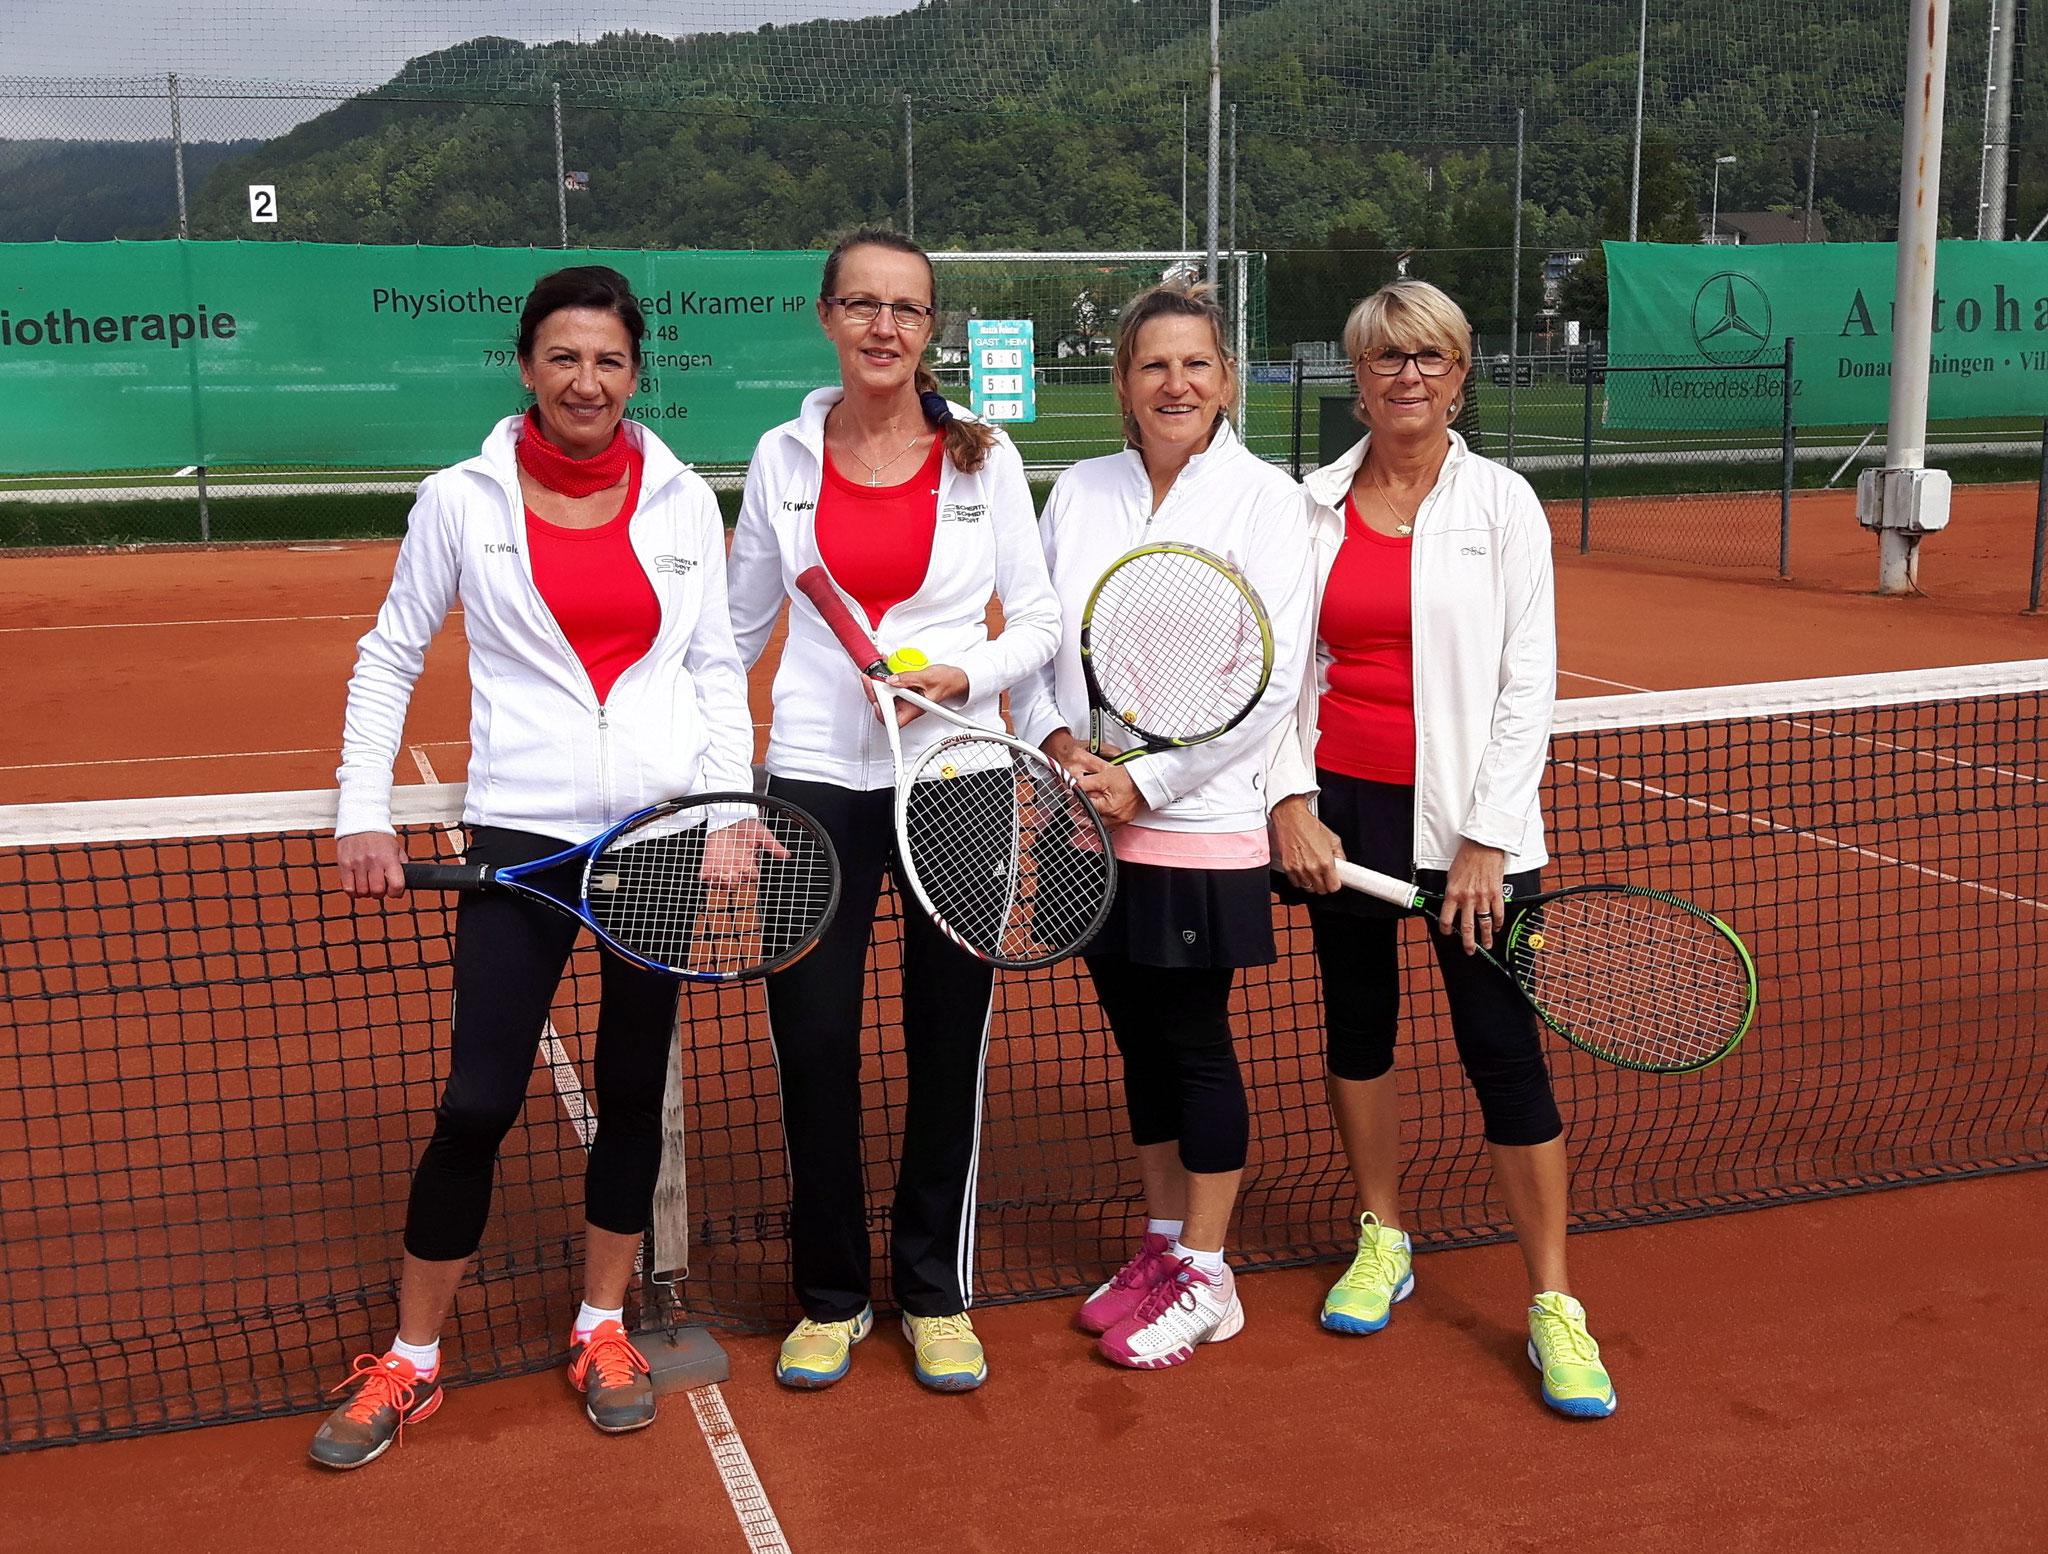 Damen Doppel v.l Ulrike Ebner, Ulrika Schirmaier (CM), Friedel Henze (CM), Tina Skopnik